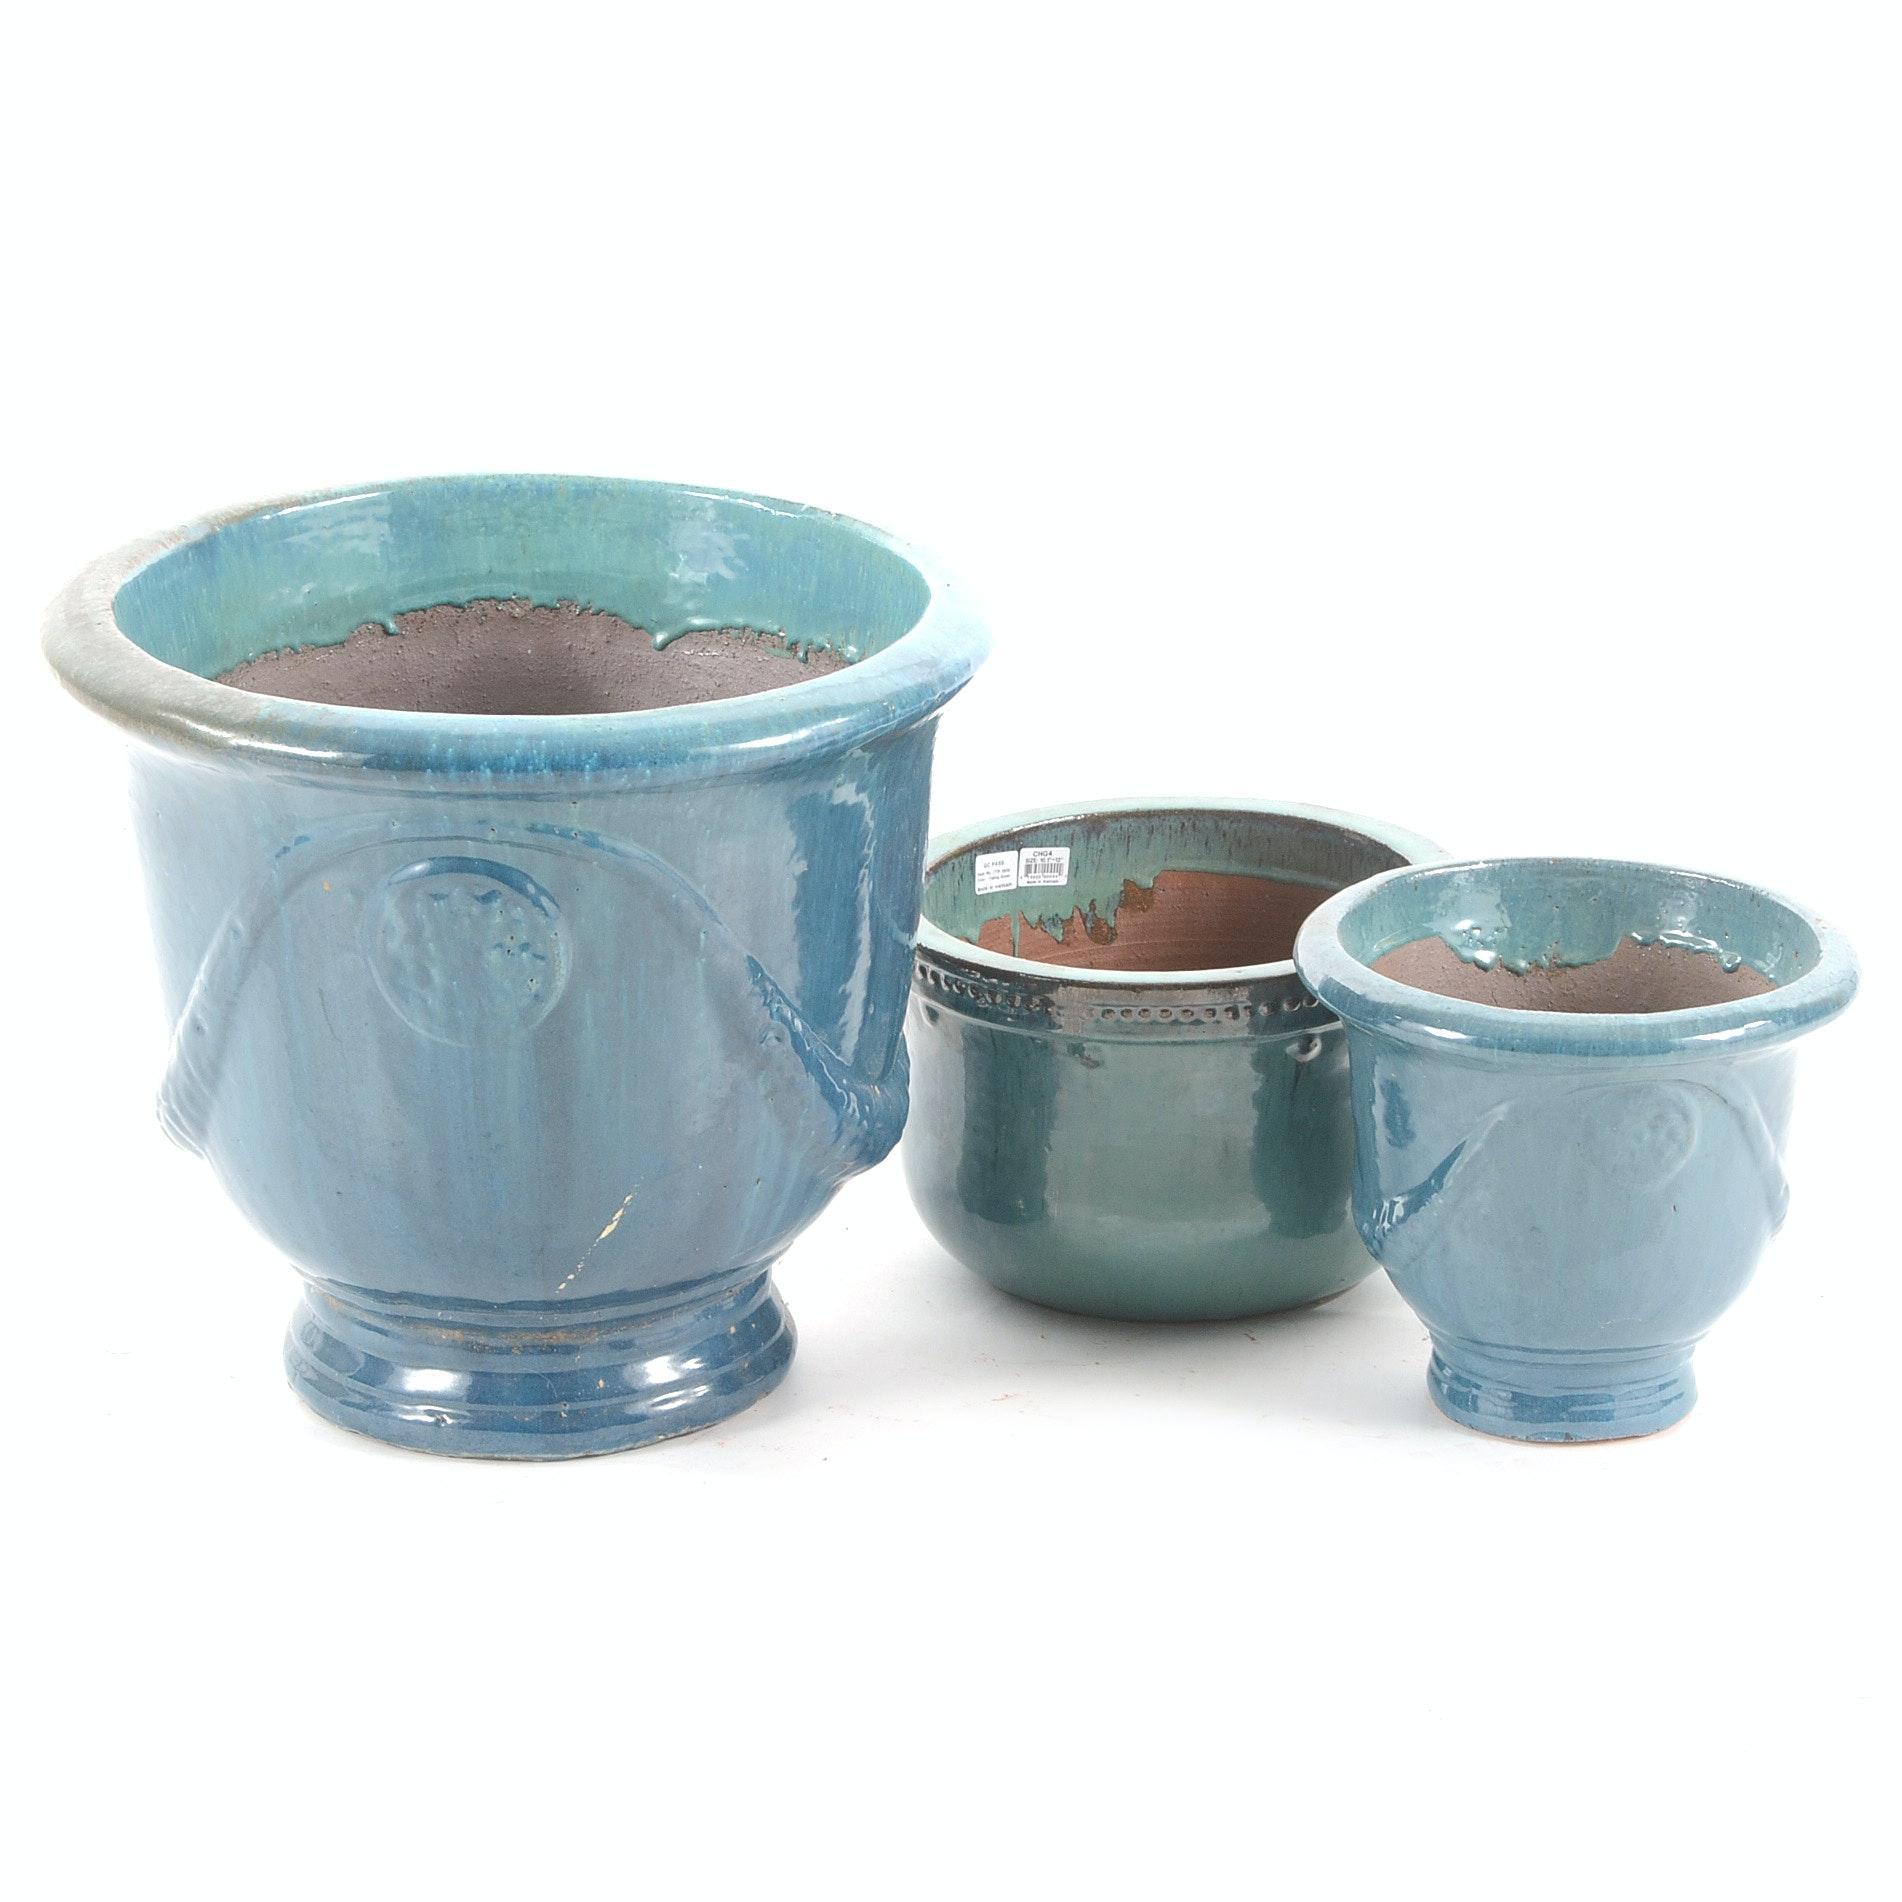 Turquoise Blue Glazed Garden Planters